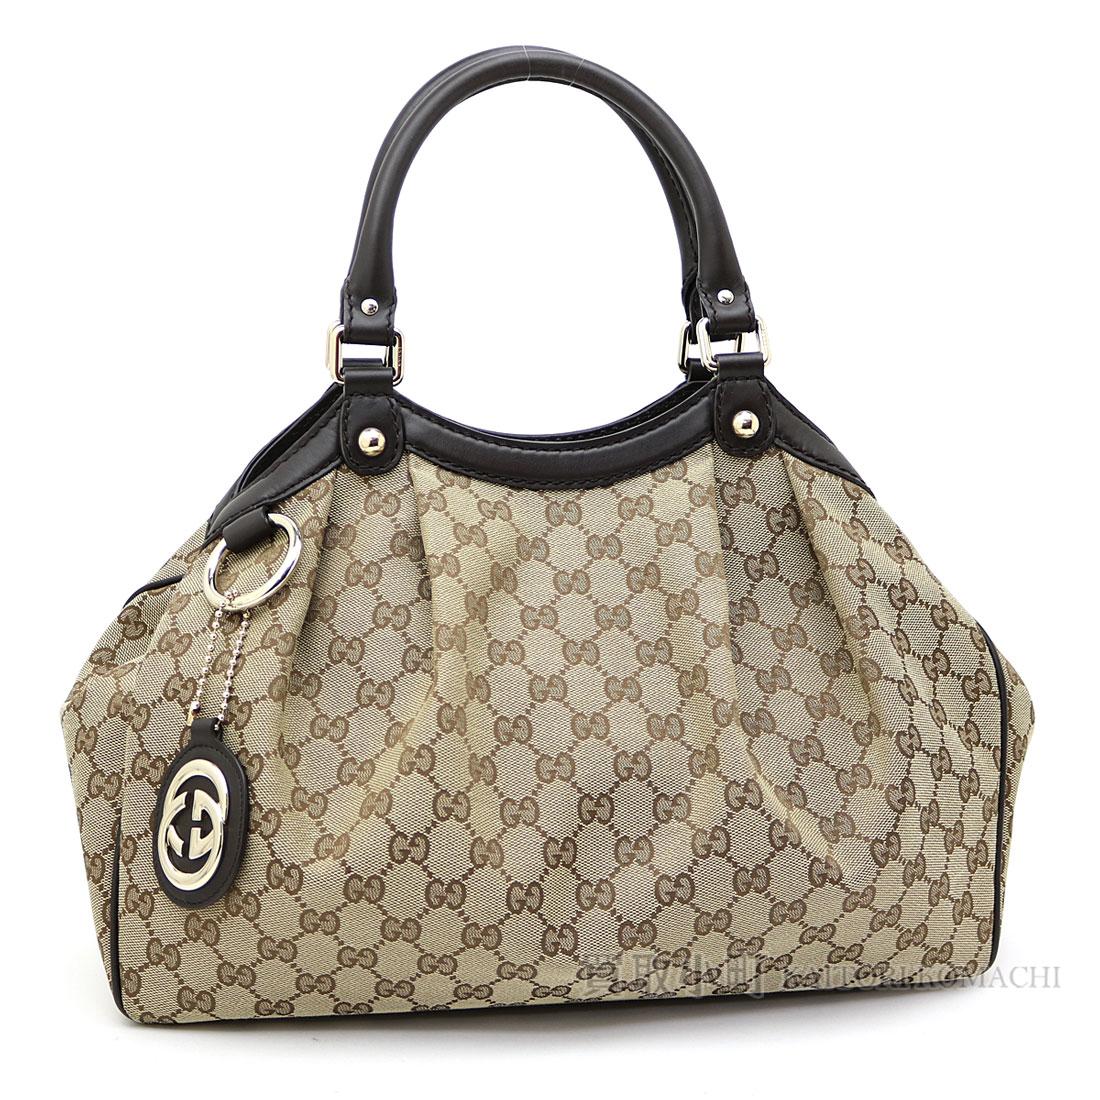 541f2e06d4f Gucci Sioux key original GG canvas tote bag medium size beige X dark brown  interlocking grip G charm shoulder bag handbag 211944 FAFXG 9643 Sukey  Medium ...